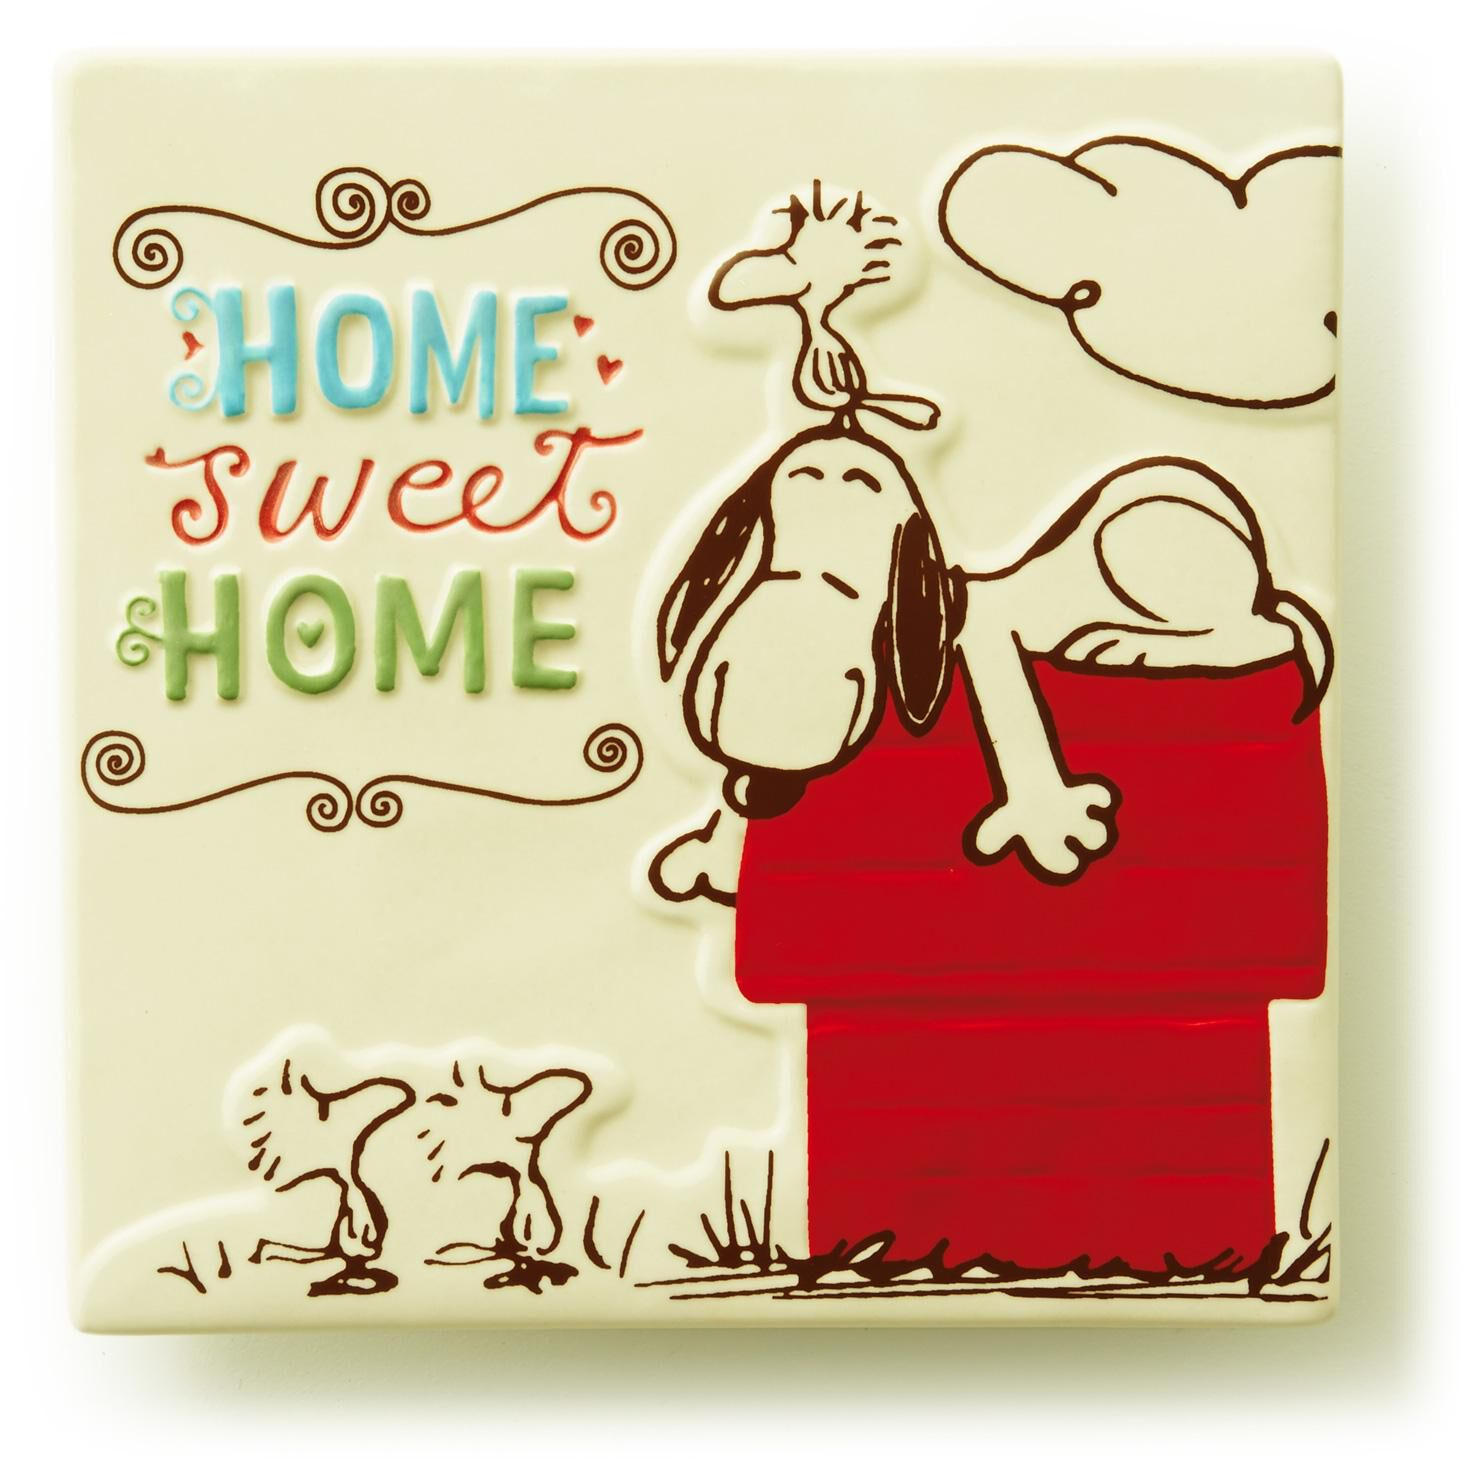 how sweet home